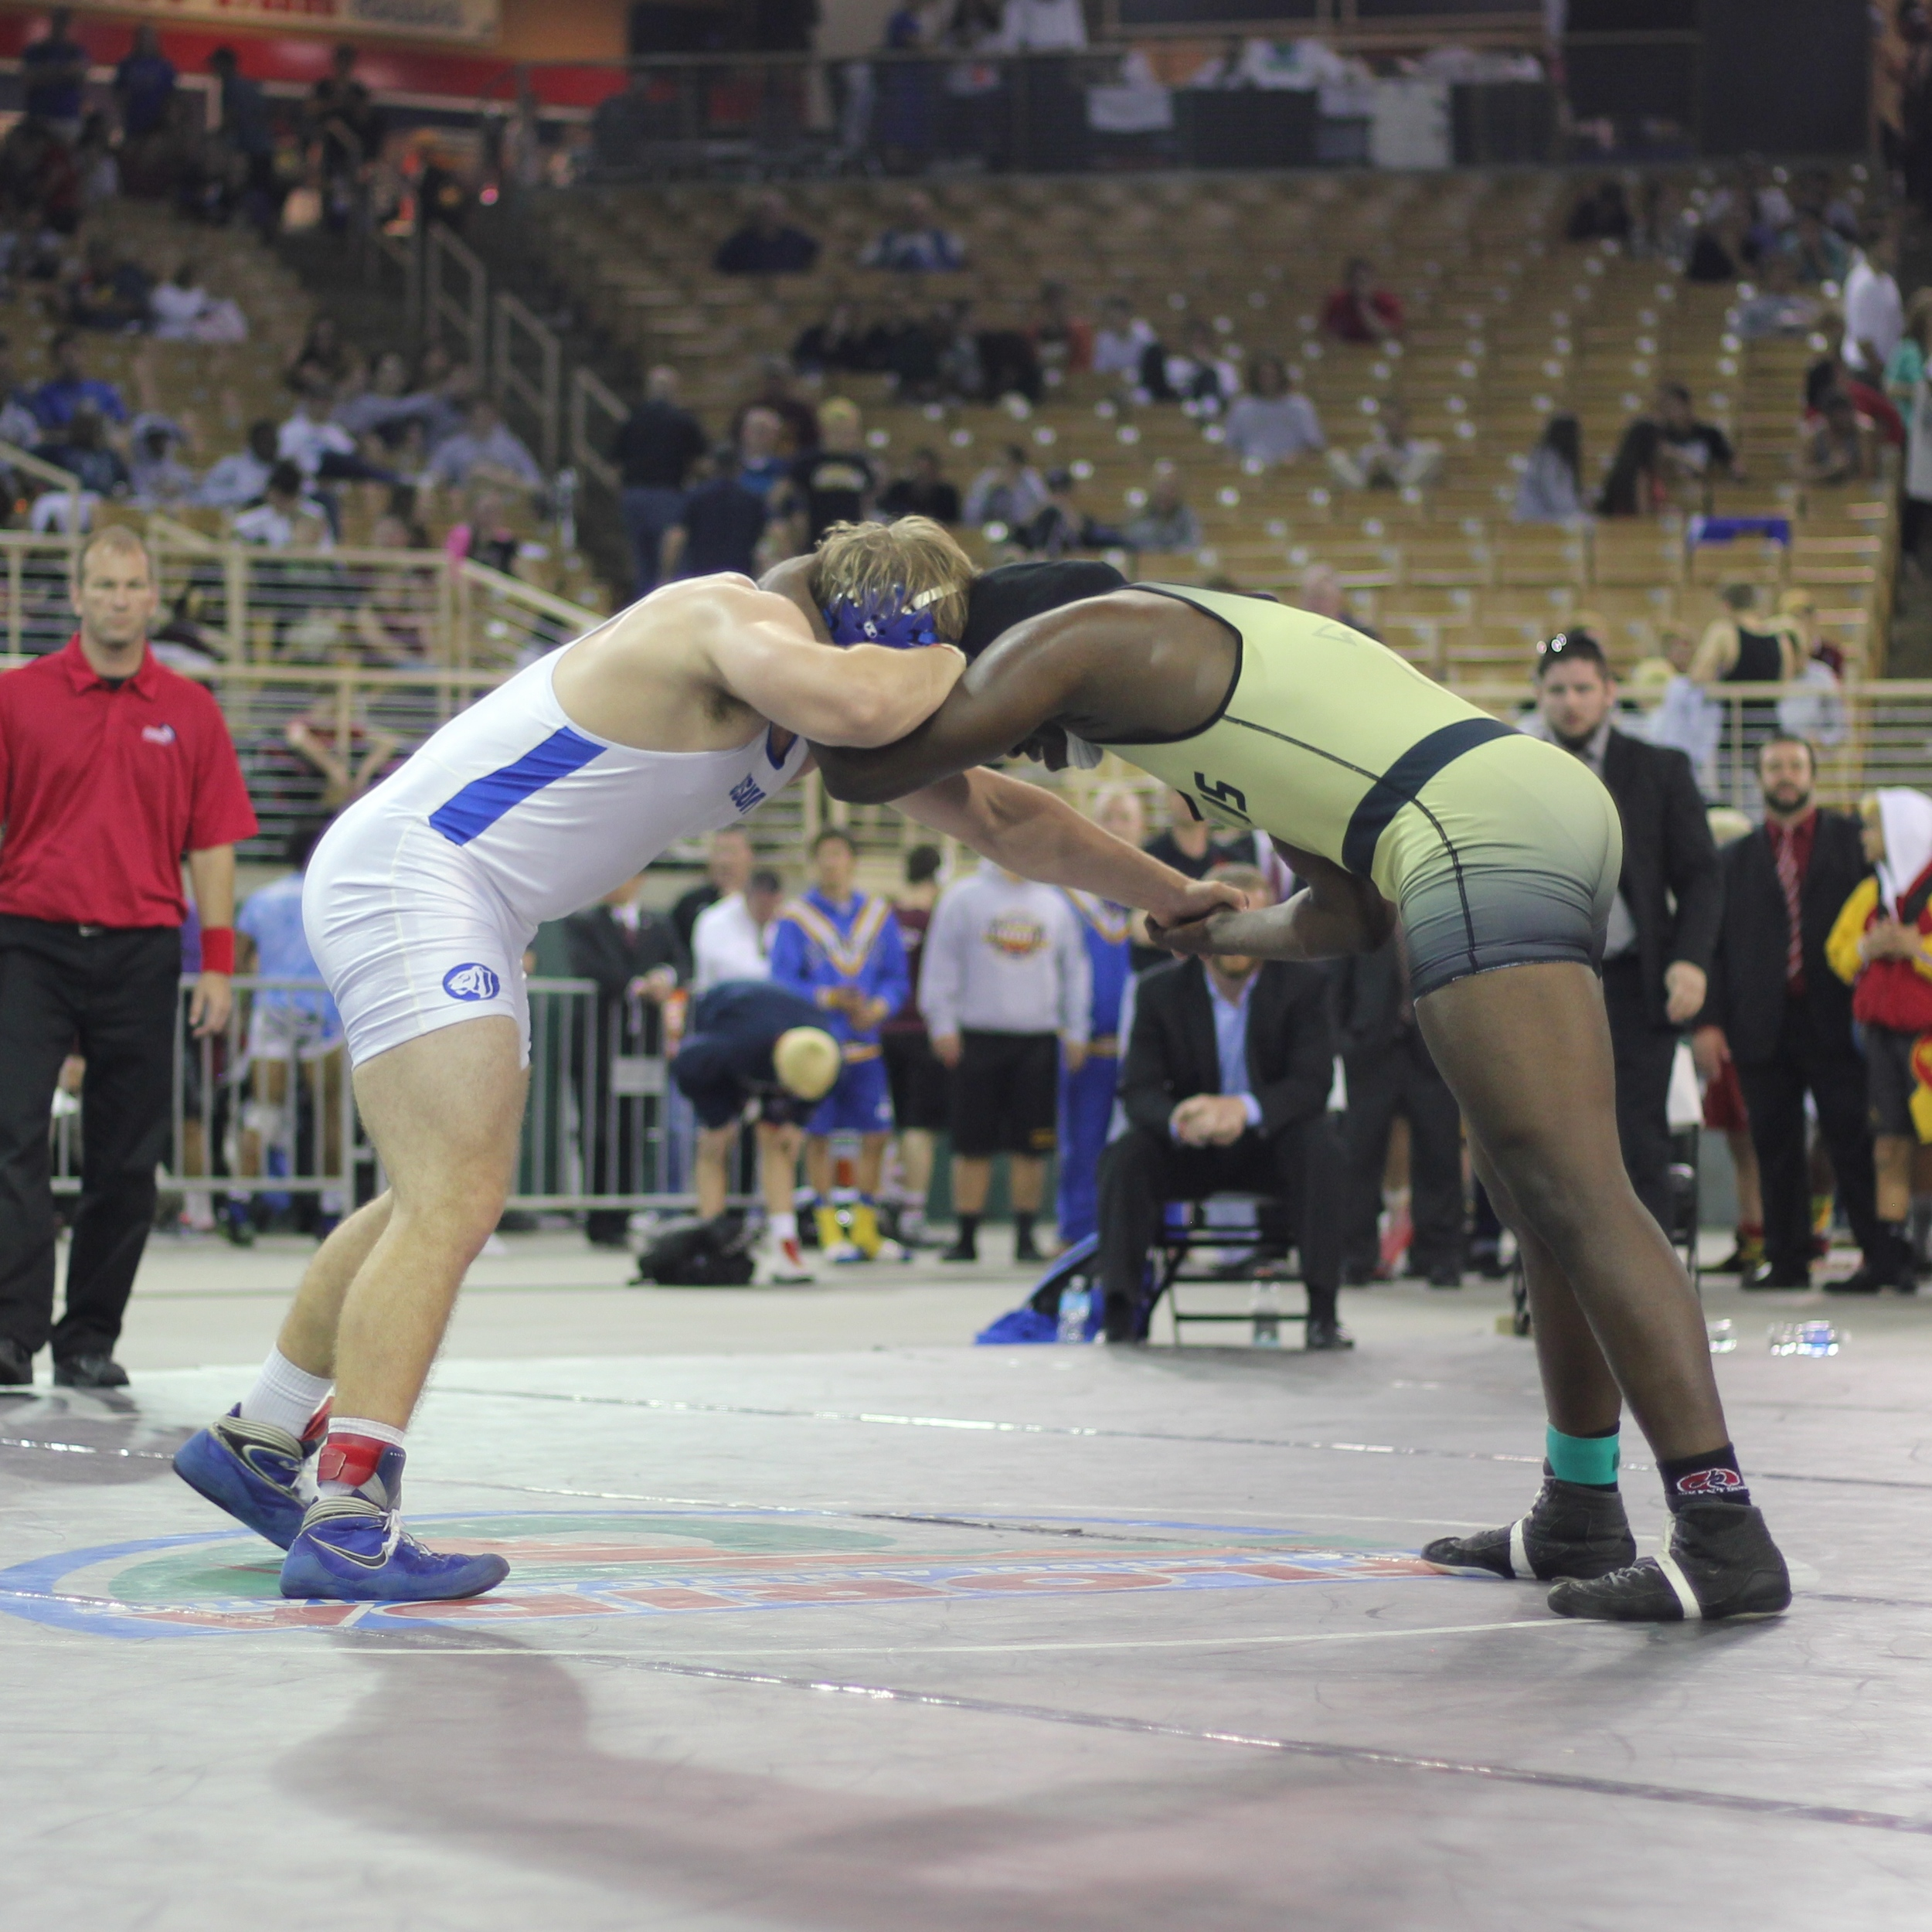 Mosco beat Warren 5-4 2 ot to win the 2015 2A 220 lb.title